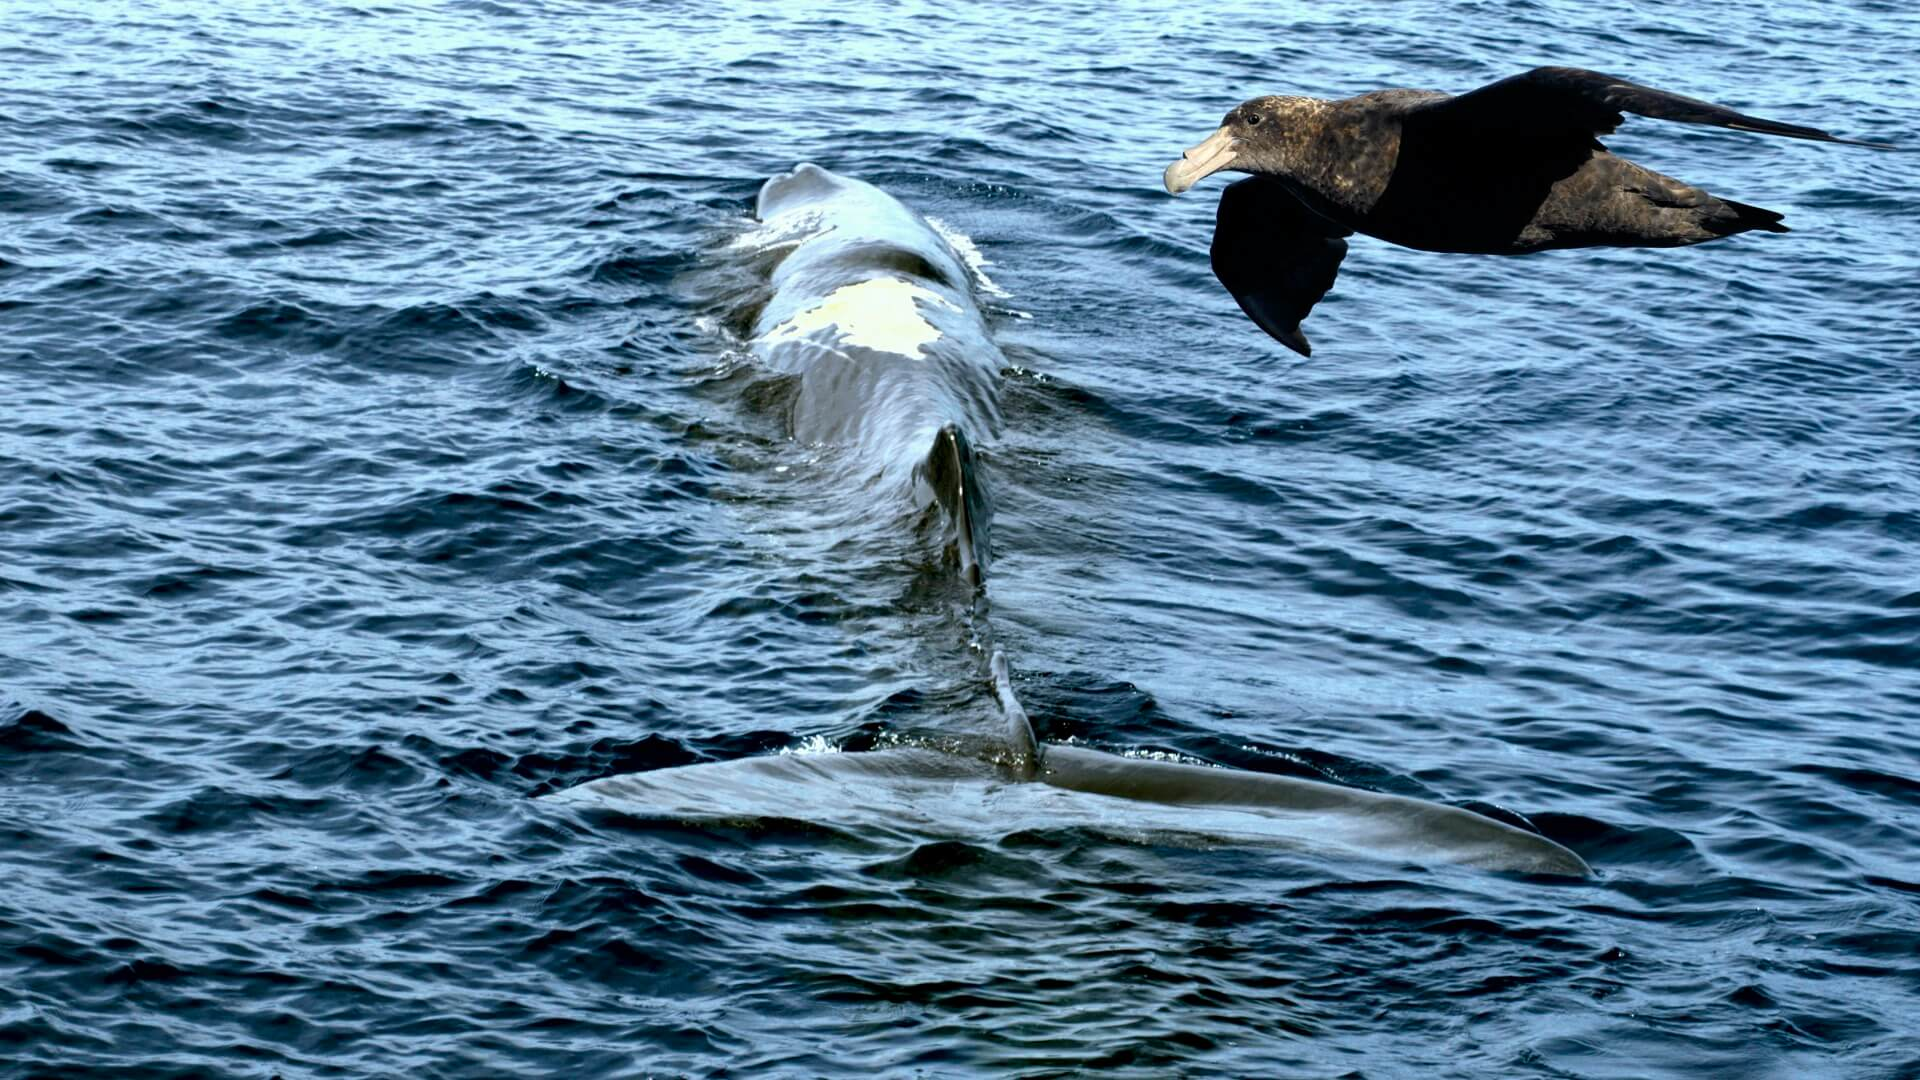 Riesensturmvögel attackieren Pottwale